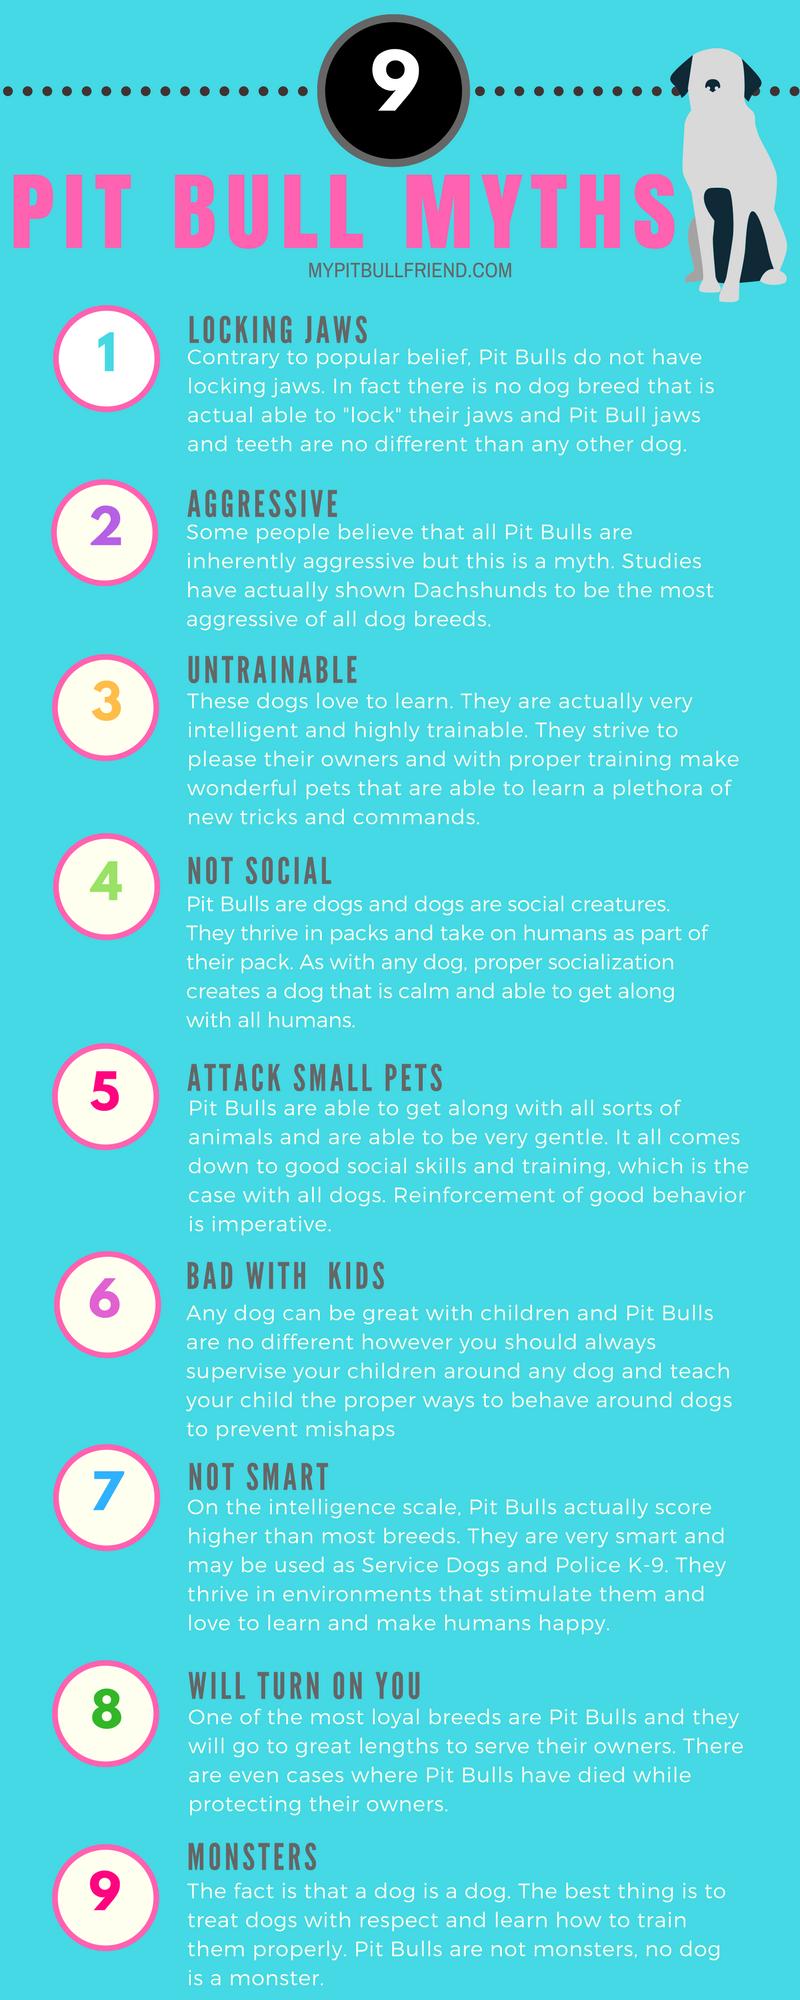 9 Pit Bull Myths My Pit Bull Friend